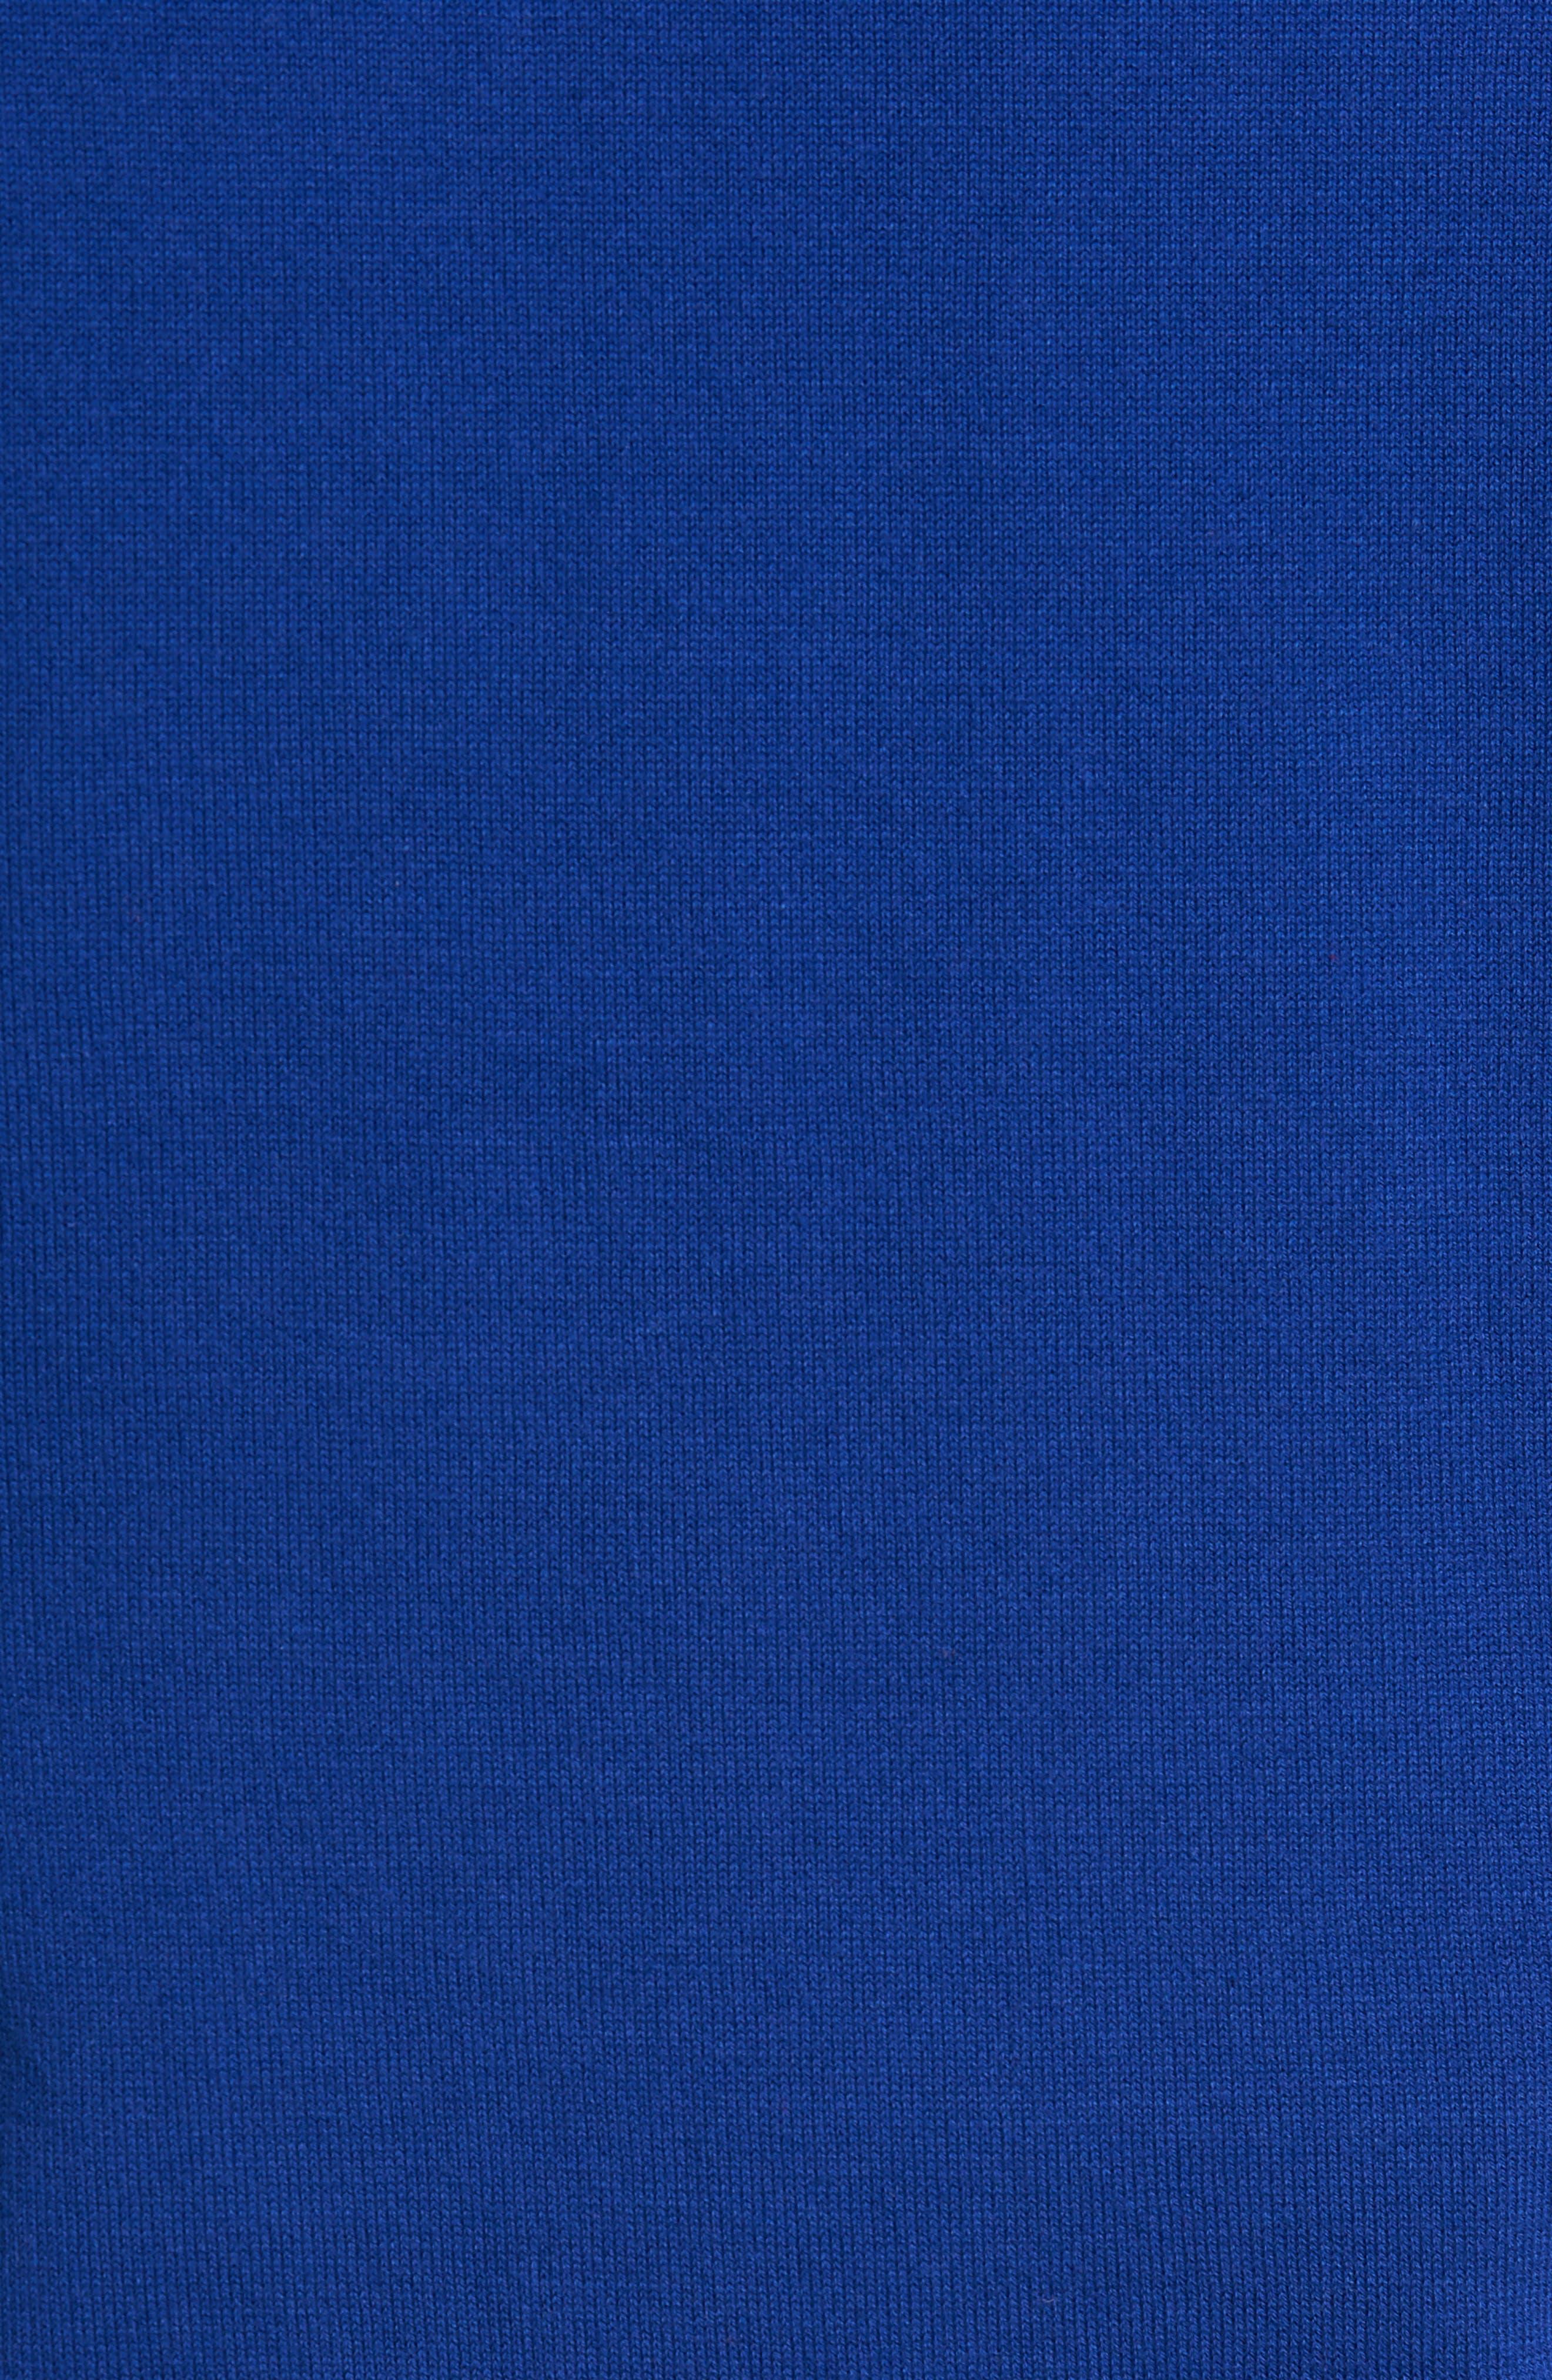 CUTTER & BUCK, Lakemont Half Zip Sweater, Alternate thumbnail 5, color, 419